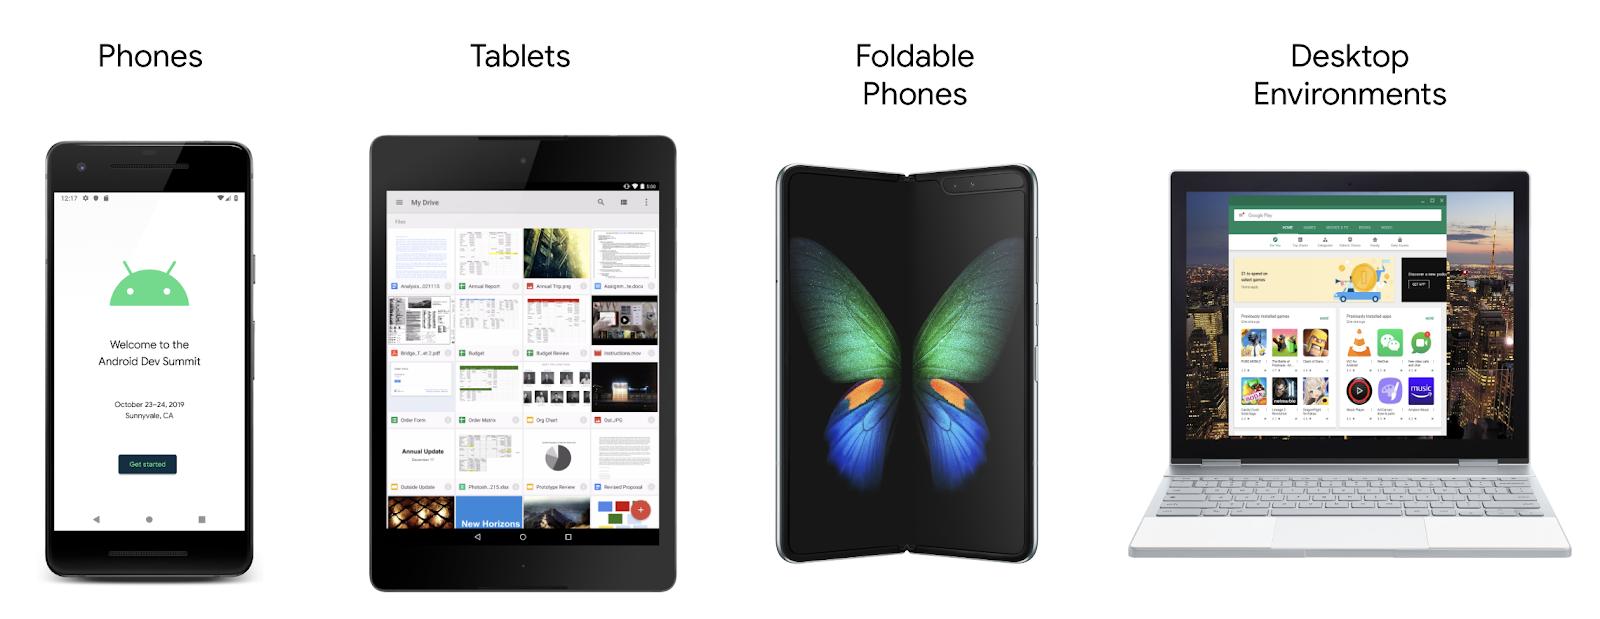 Phones, tablets, foldable phones, desktops